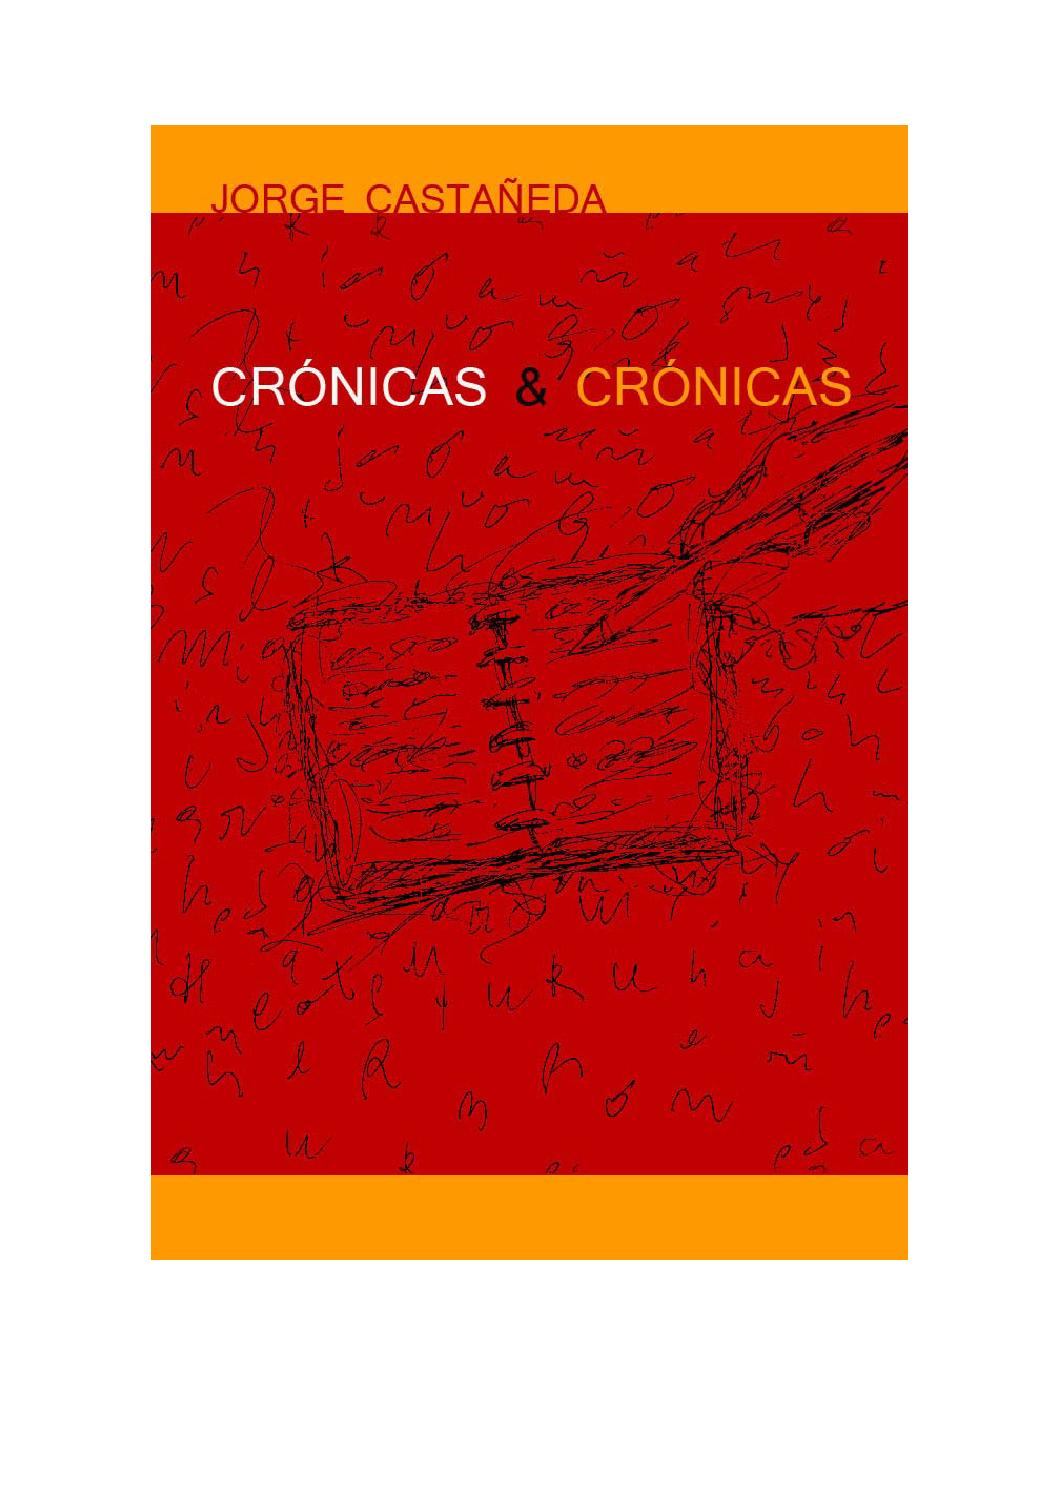 622b832a27 Cronicas & cronicas de jorge castaneda by Ariel Puyelli - issuu